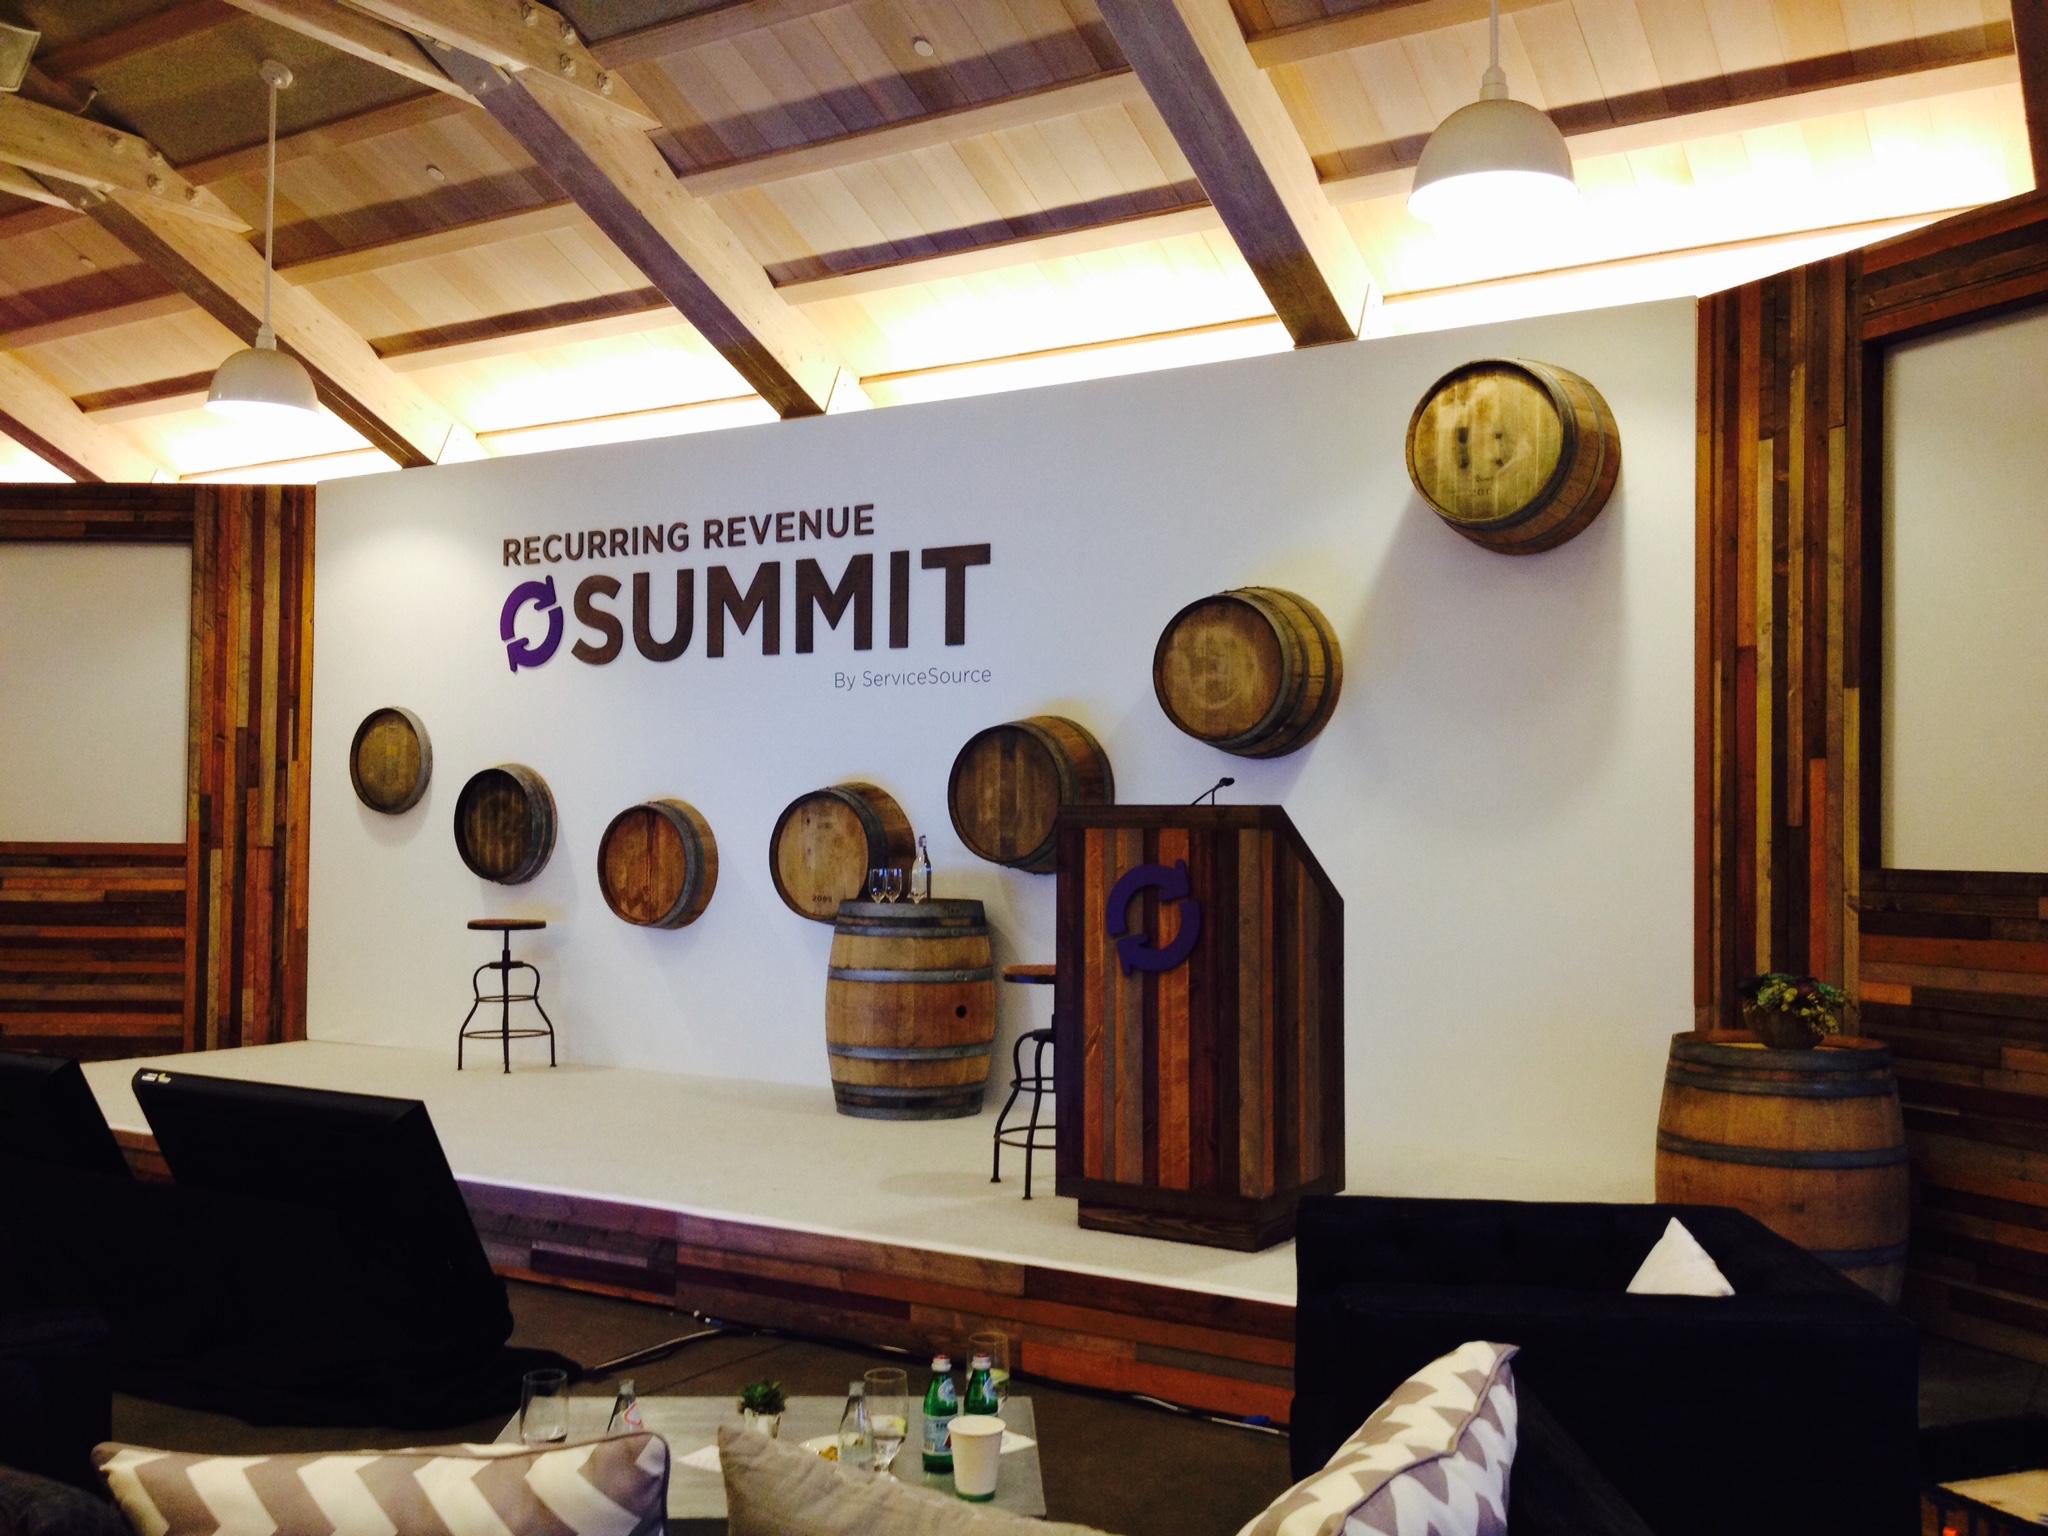 Service Source Recurring Revenue Summit 2014